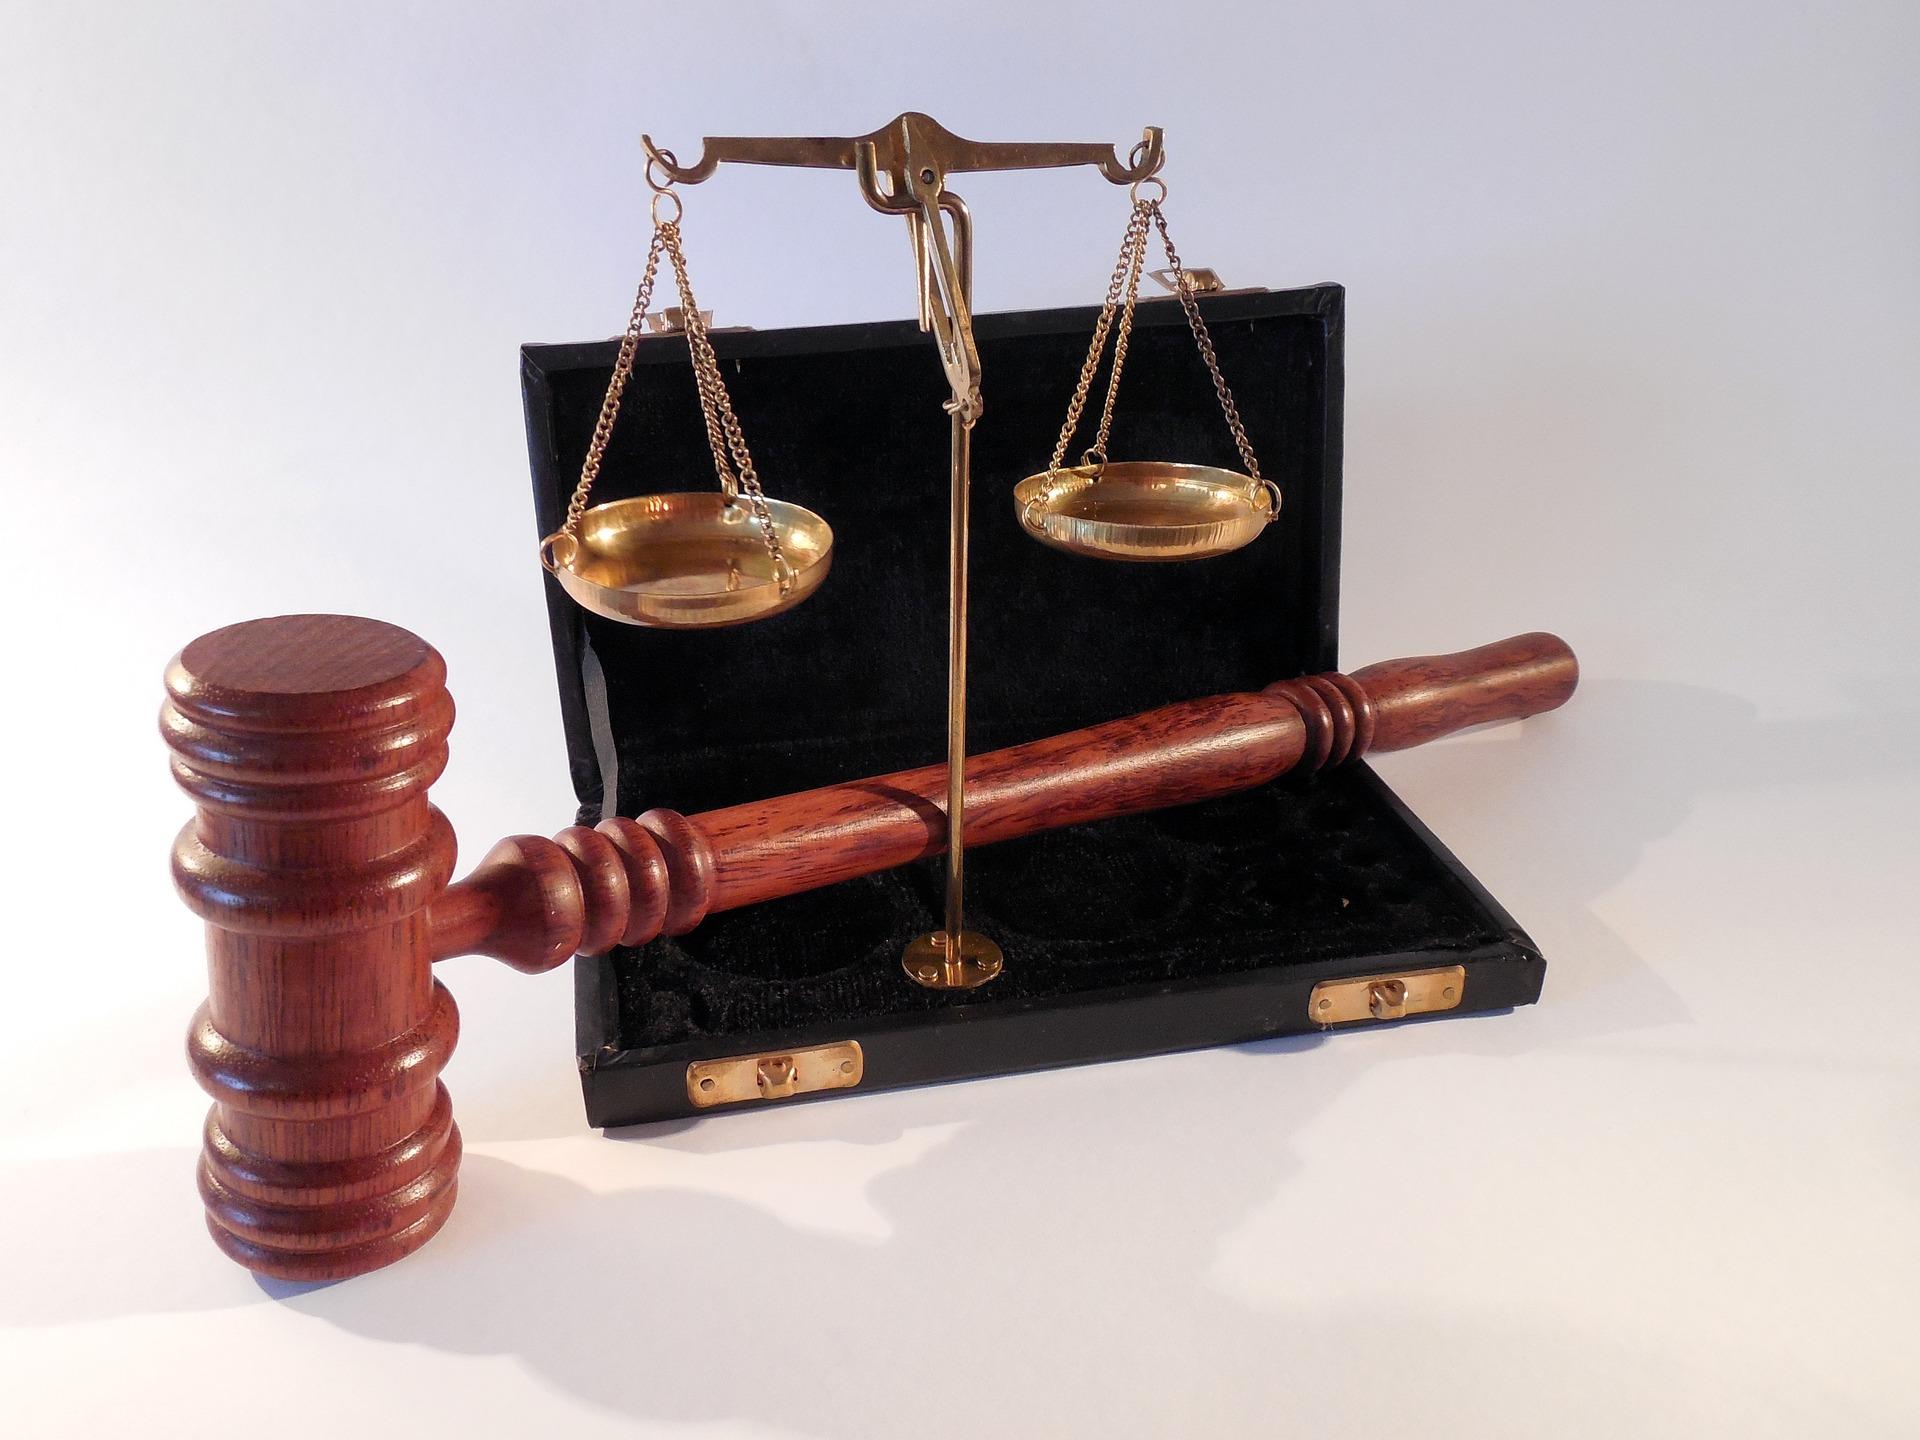 12 Presumptions of Law